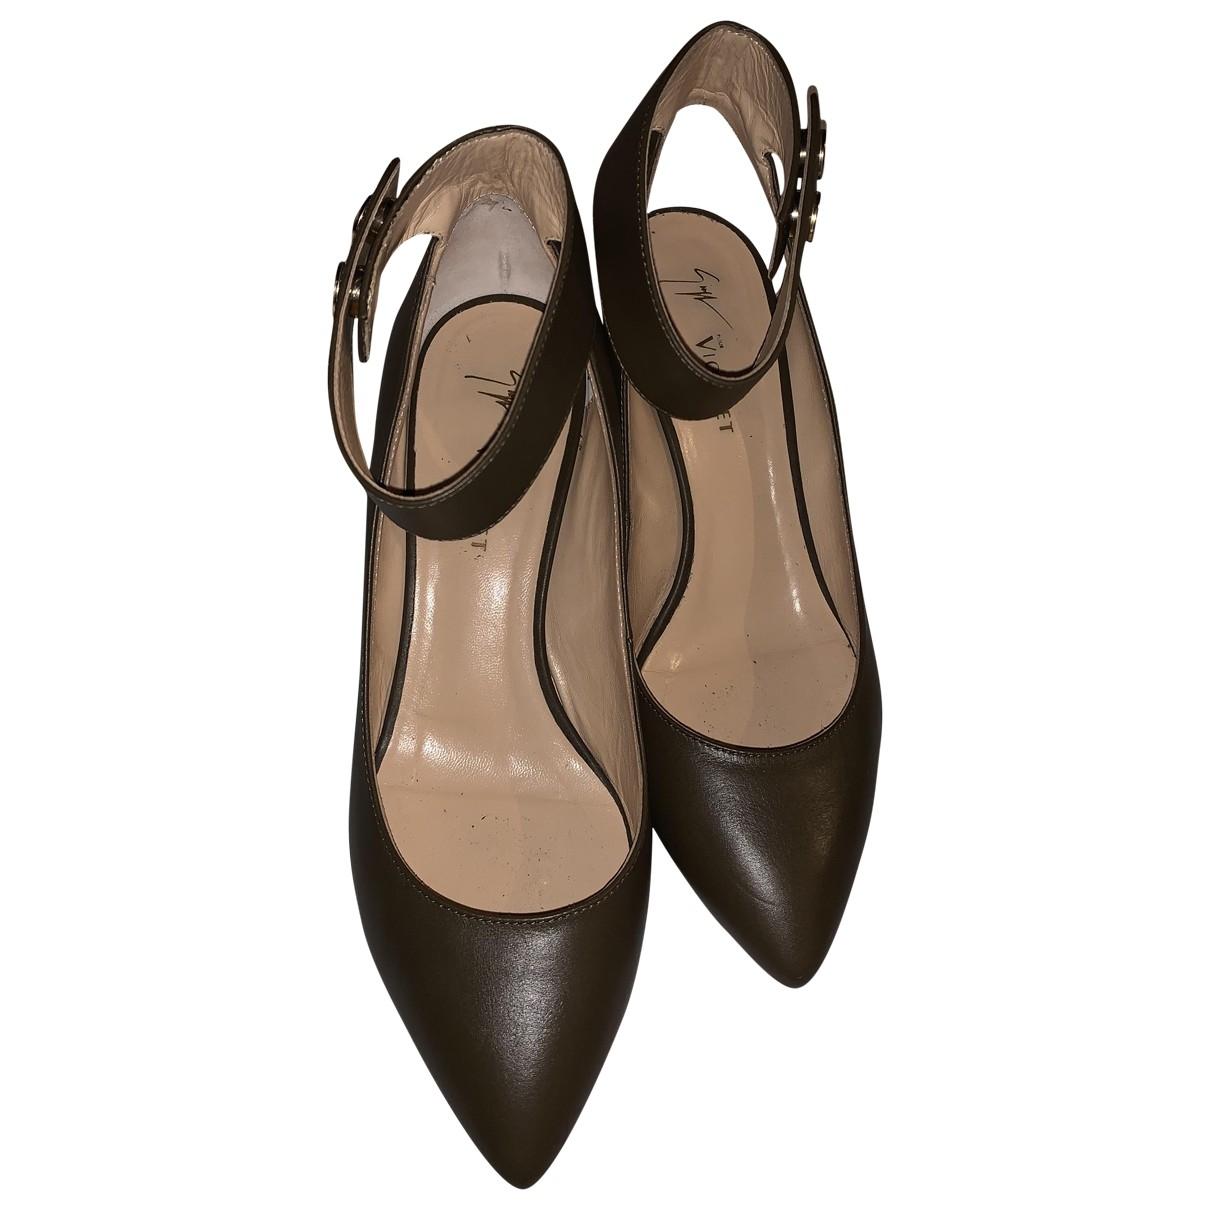 Vionnet \N Green Leather Heels for Women 40 EU